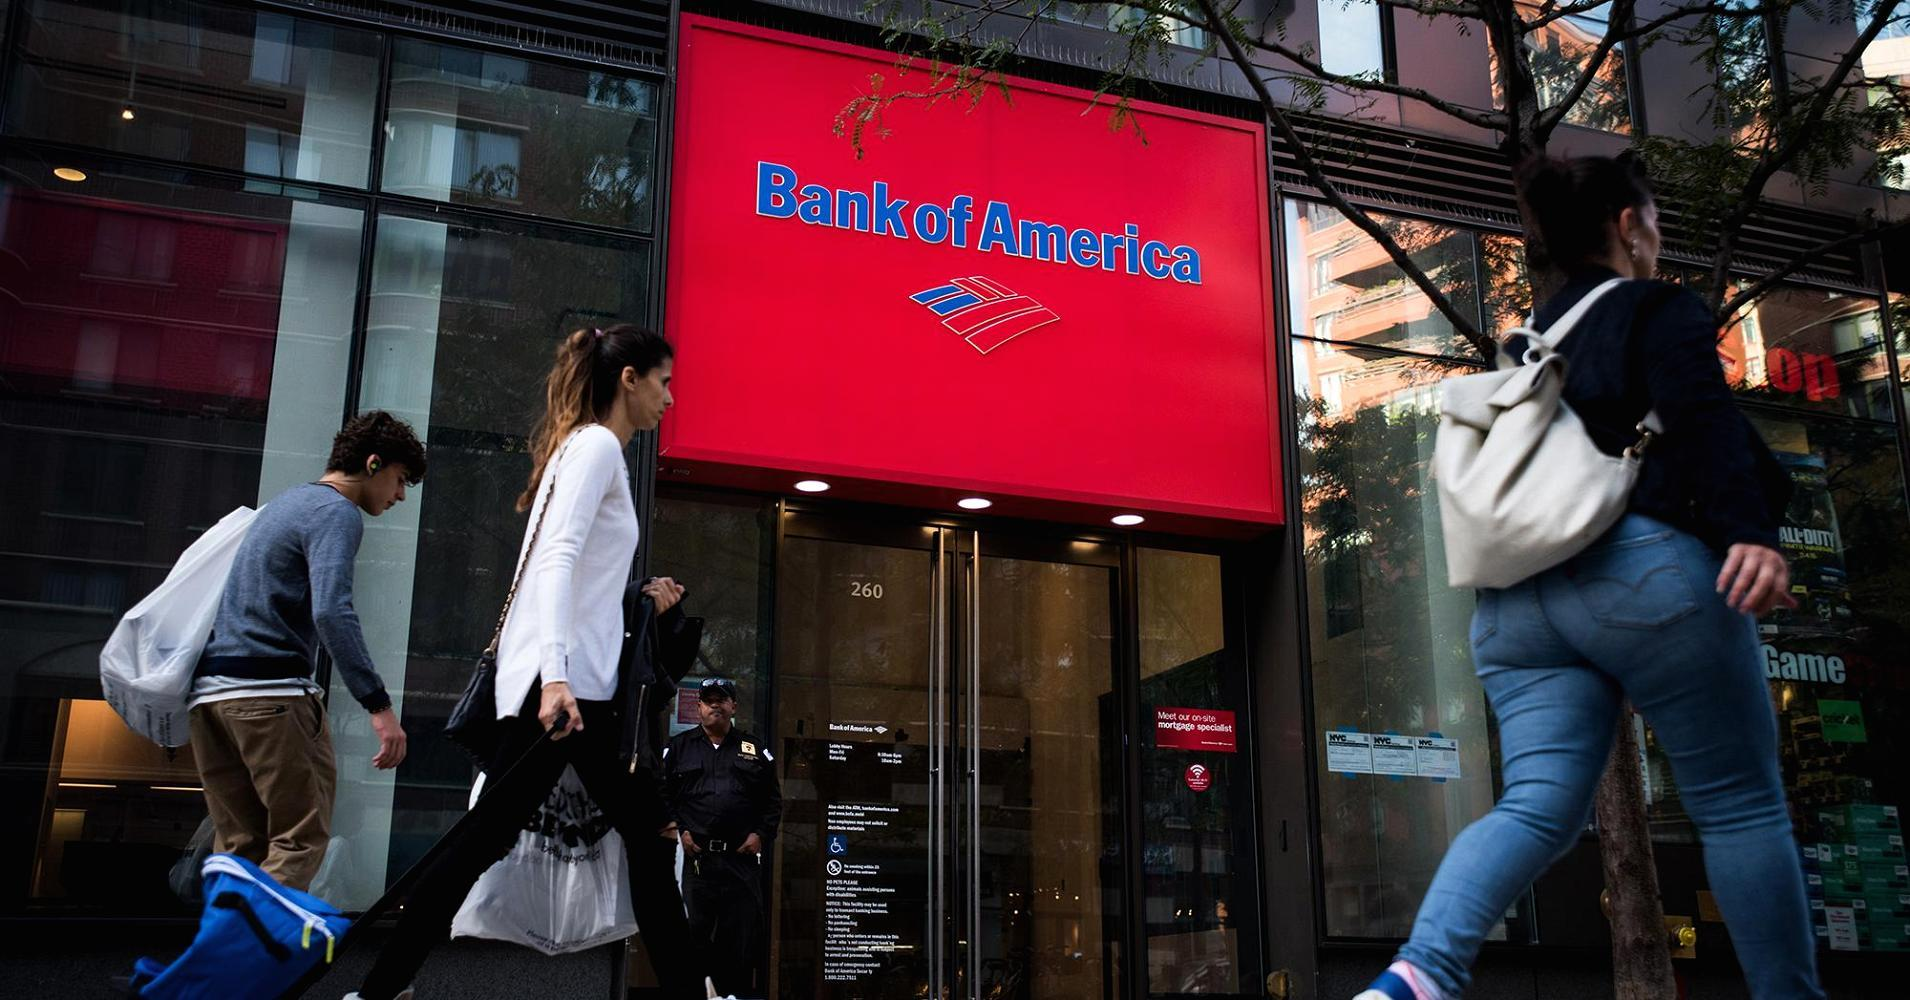 Cramer reveals the key hitting the jackpot on Bank of America